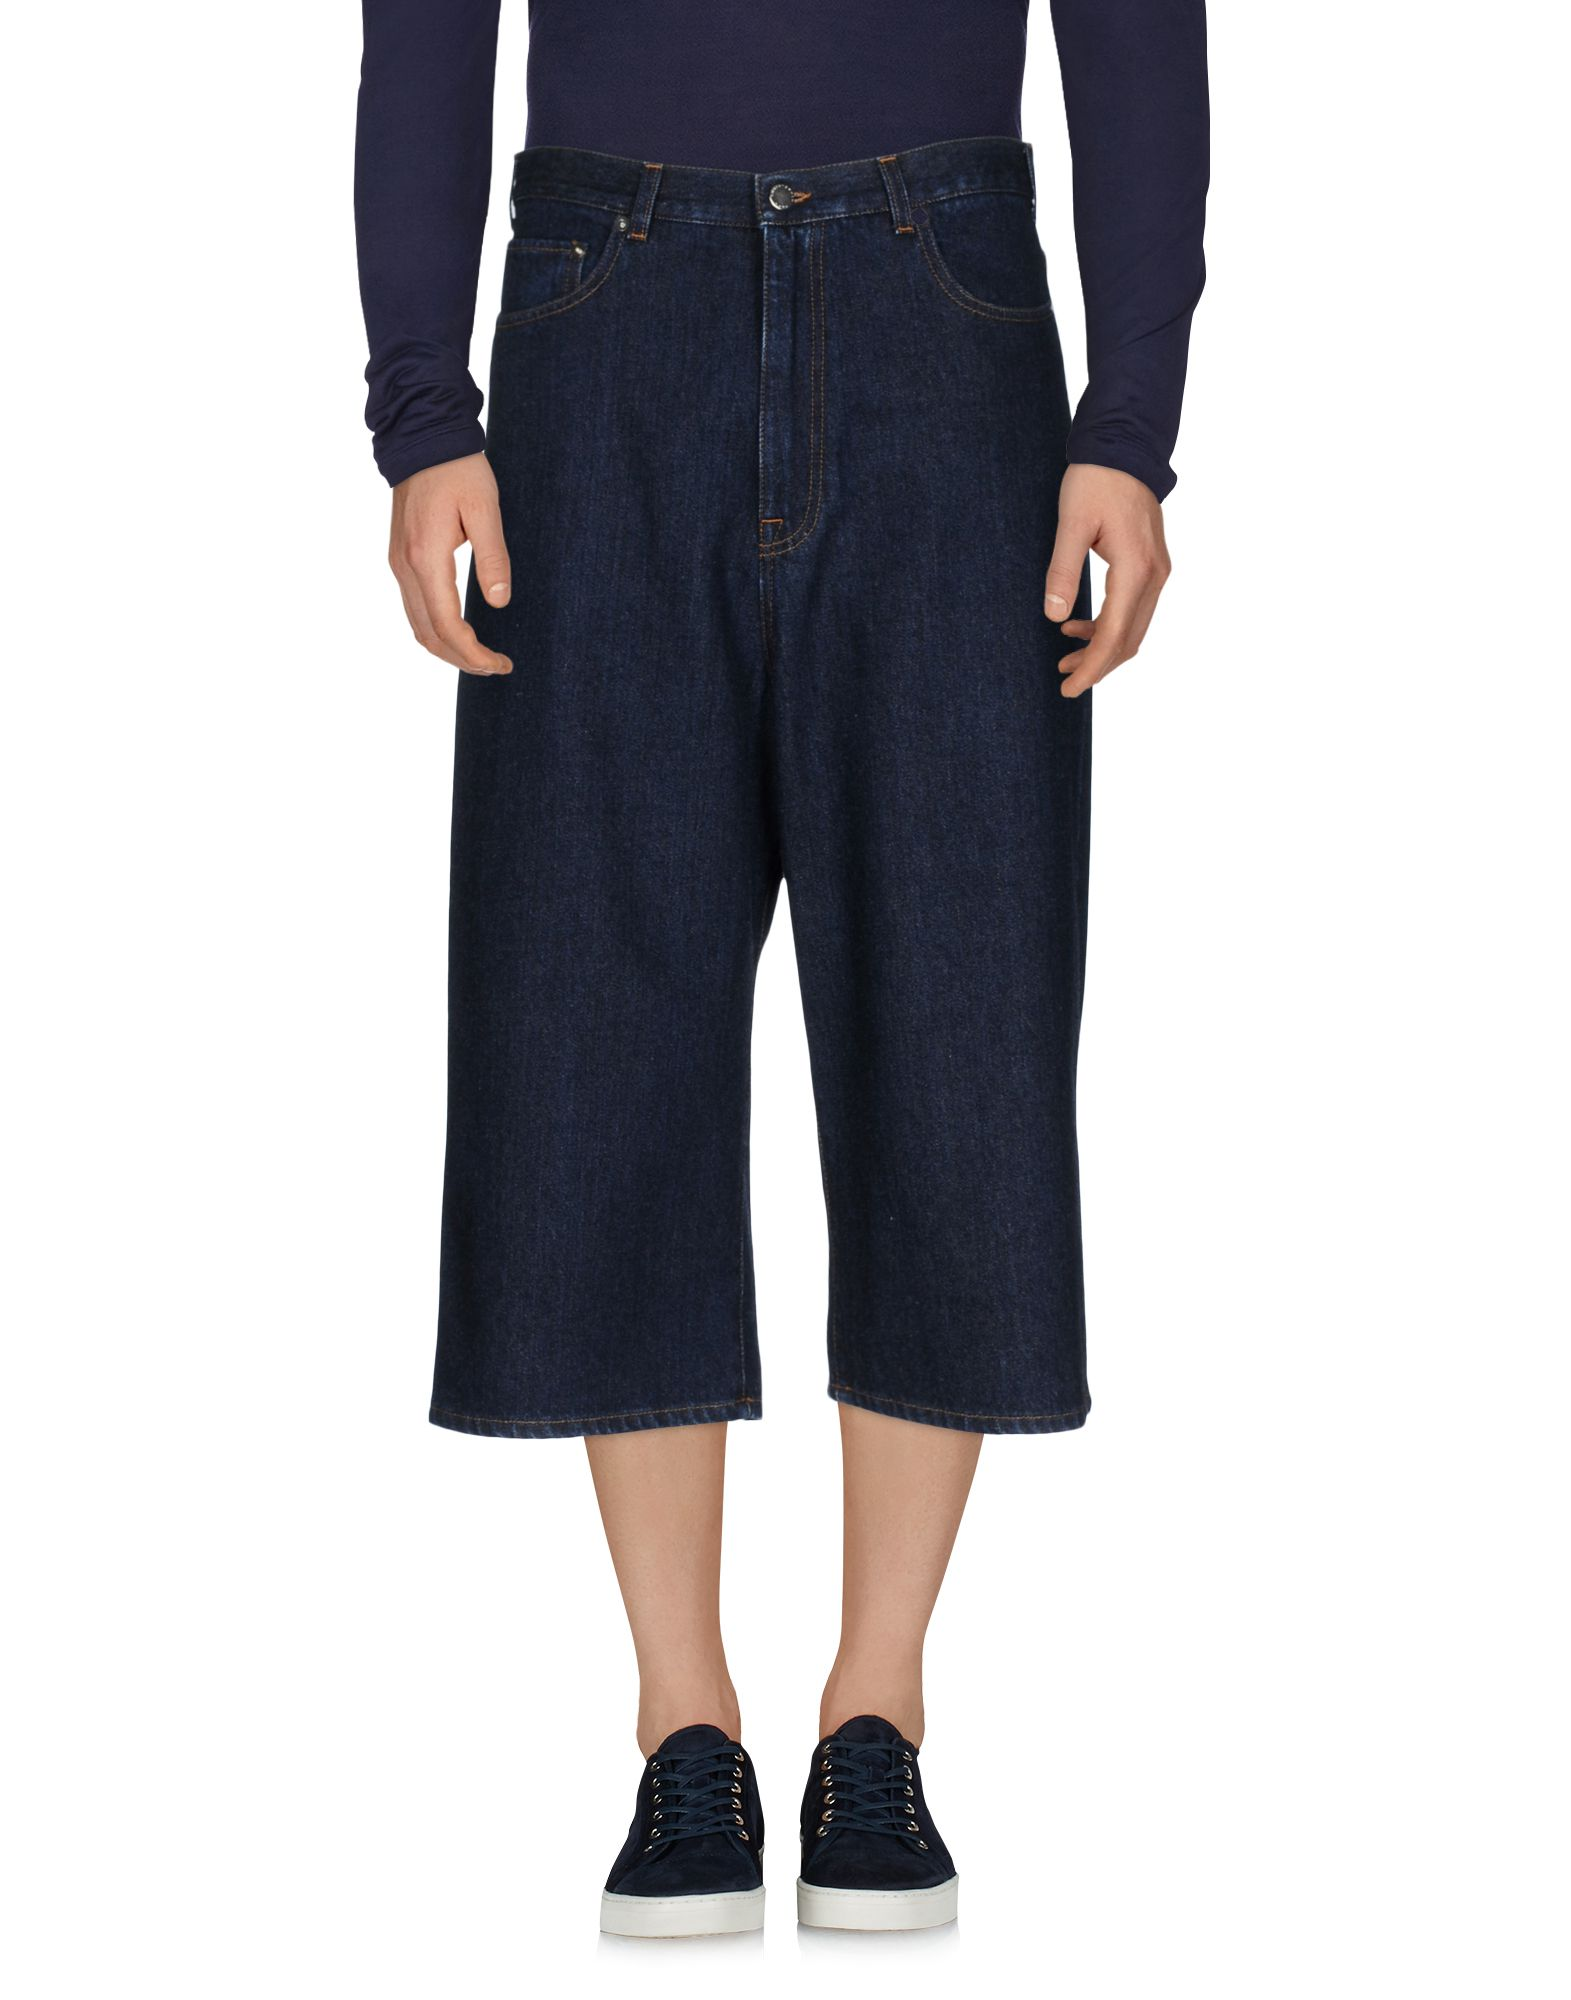 Pantaloni Jeans Christopher Kane Uomo - Acquista online su